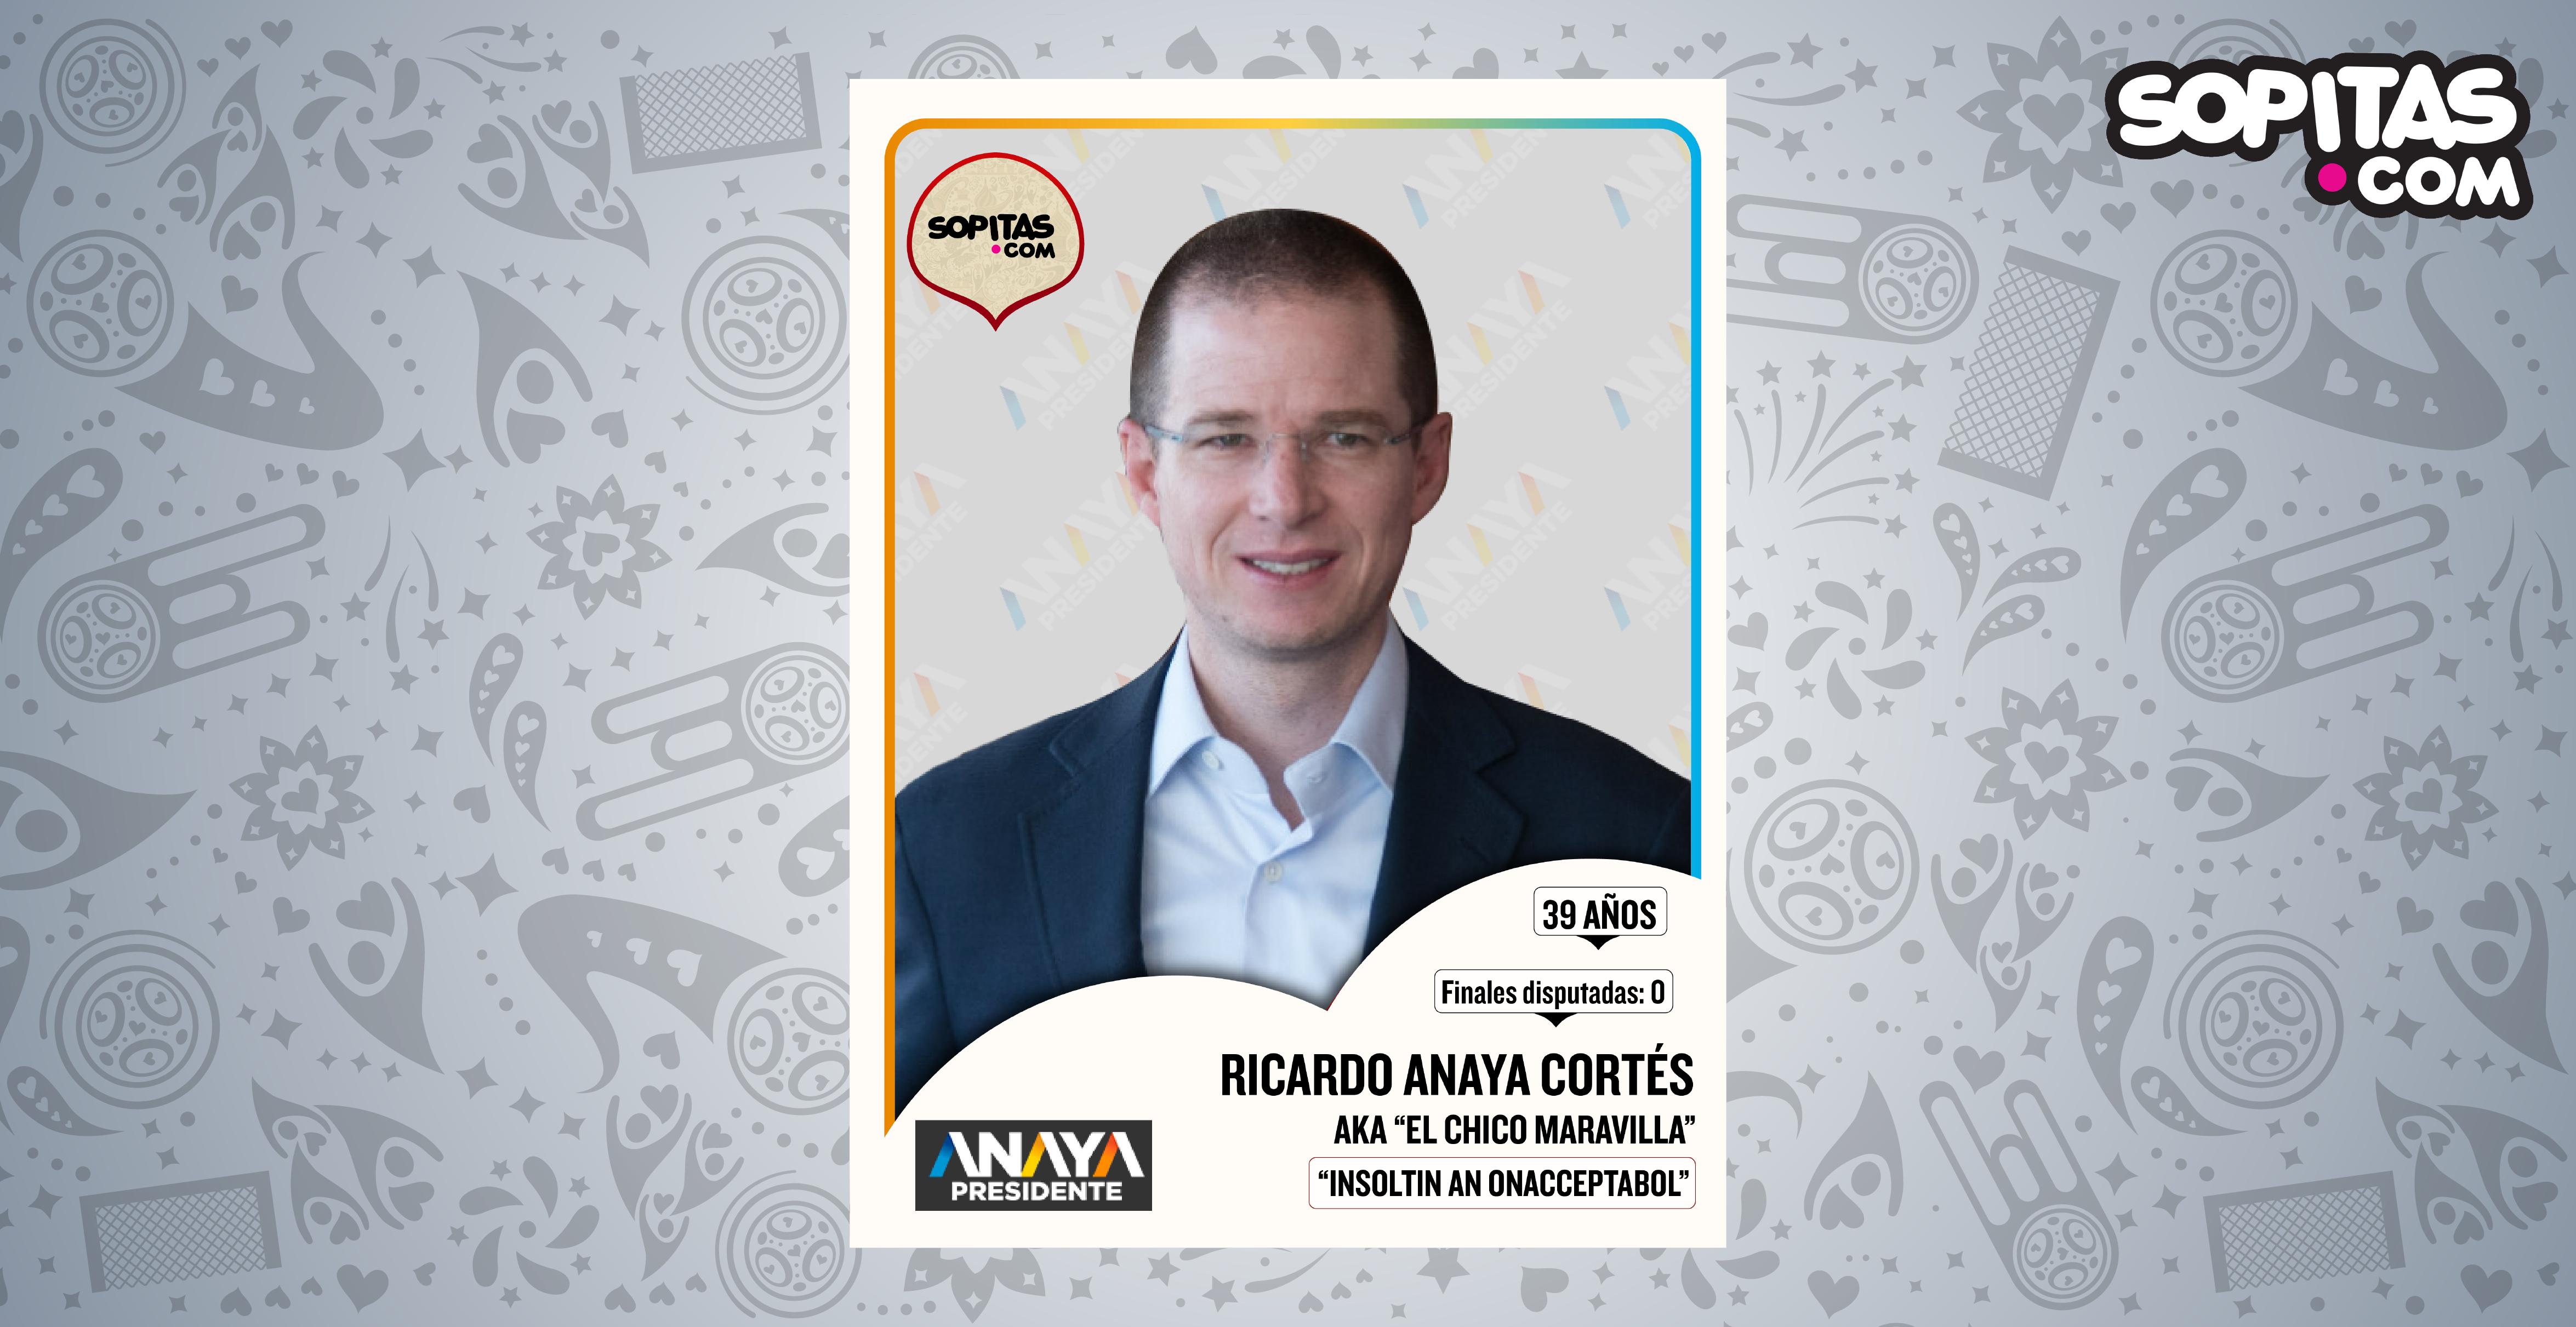 Ricardo Anaya Cortés Sopitas.com